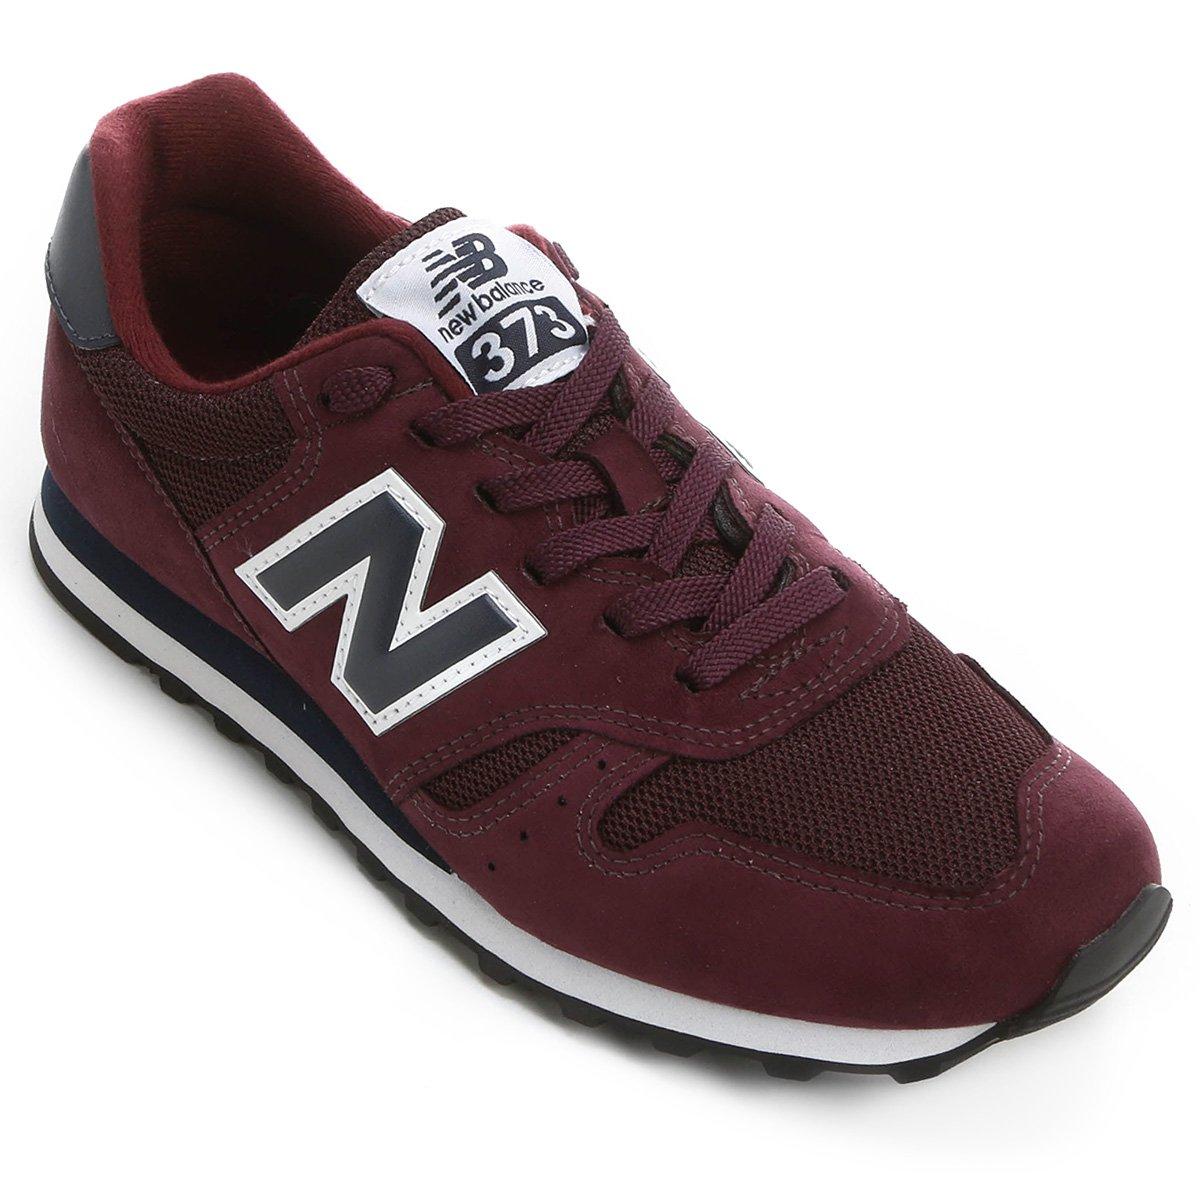 e1967f147 Tênis New Balance 373 Retrô | Netshoes